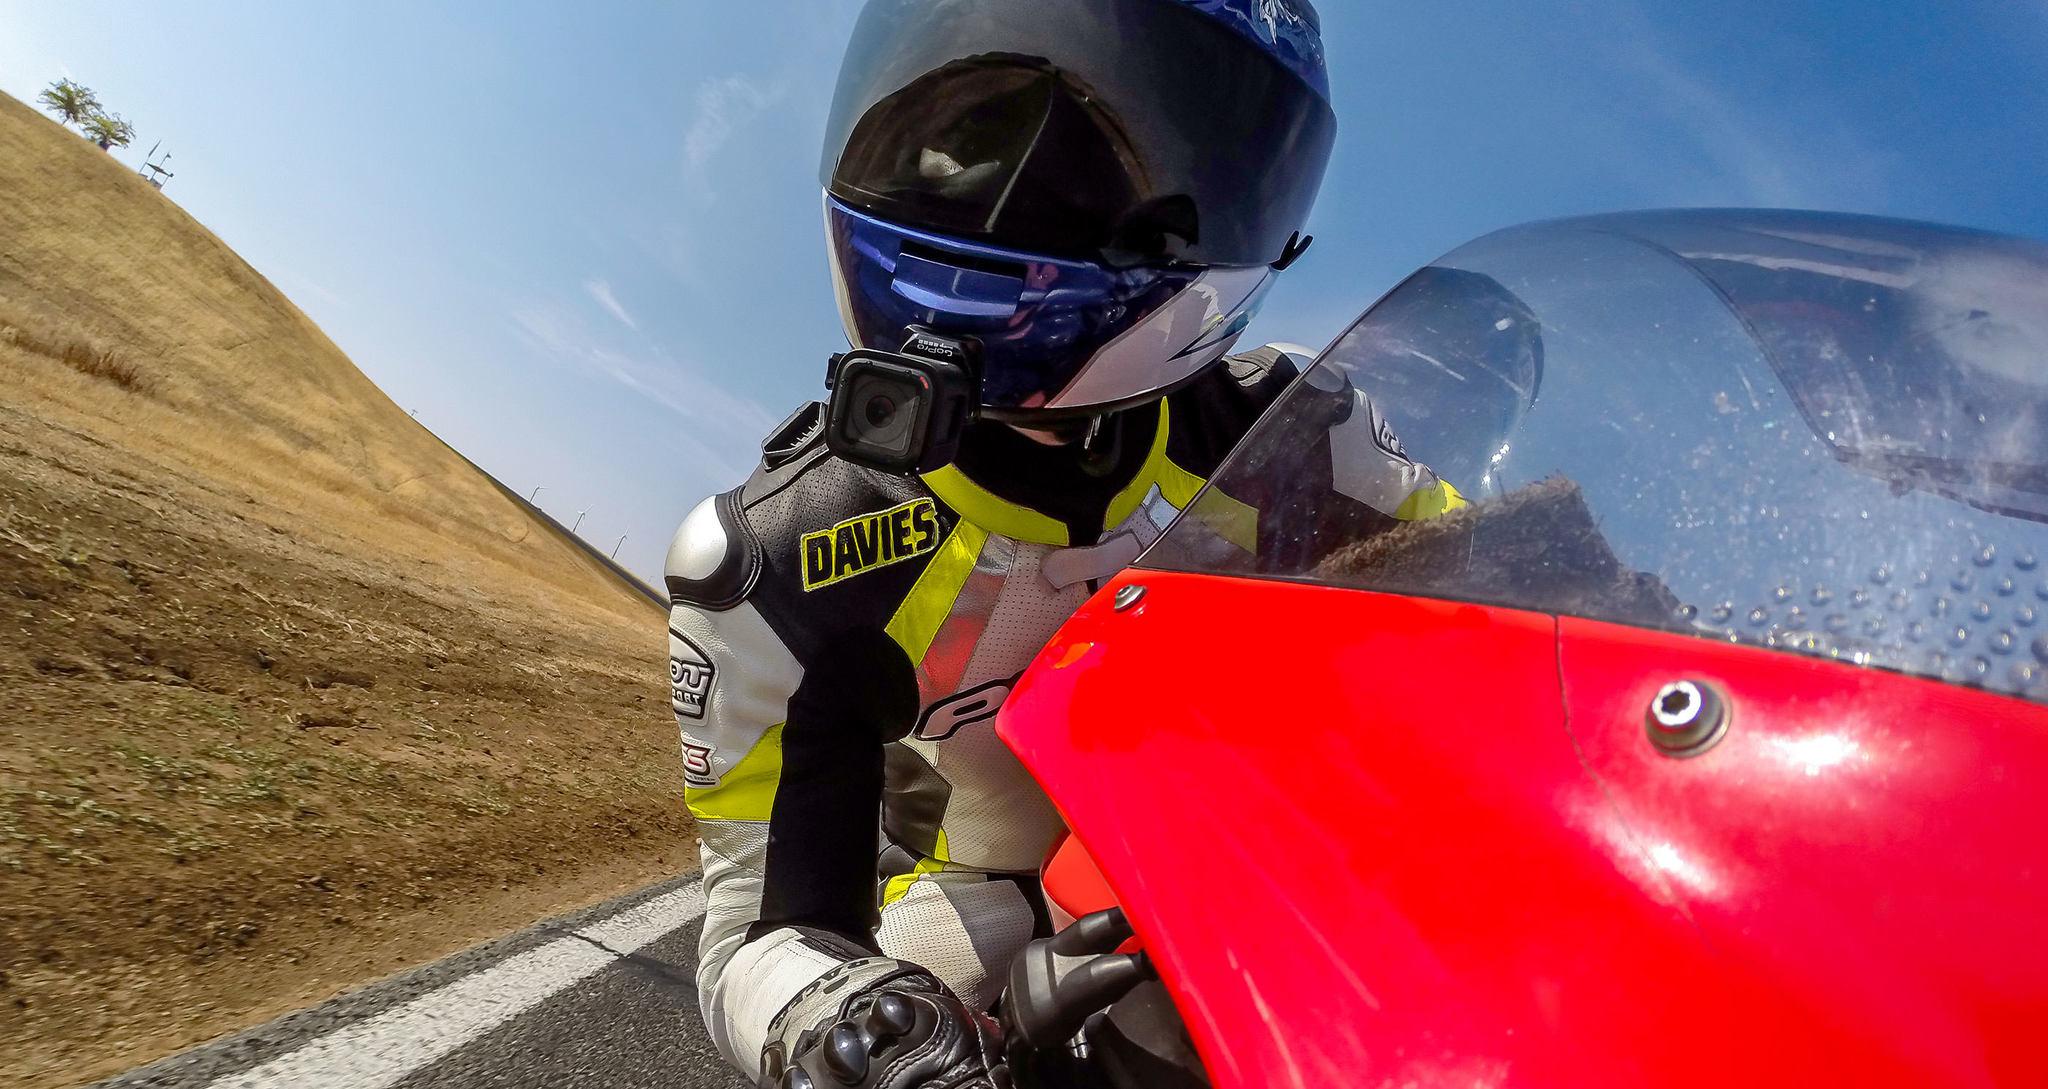 Набор плоских и изогнутых клеящихся платформ GoPro Flat + Curved Adhesive Mounts (AACFT-001) на мотоцикле